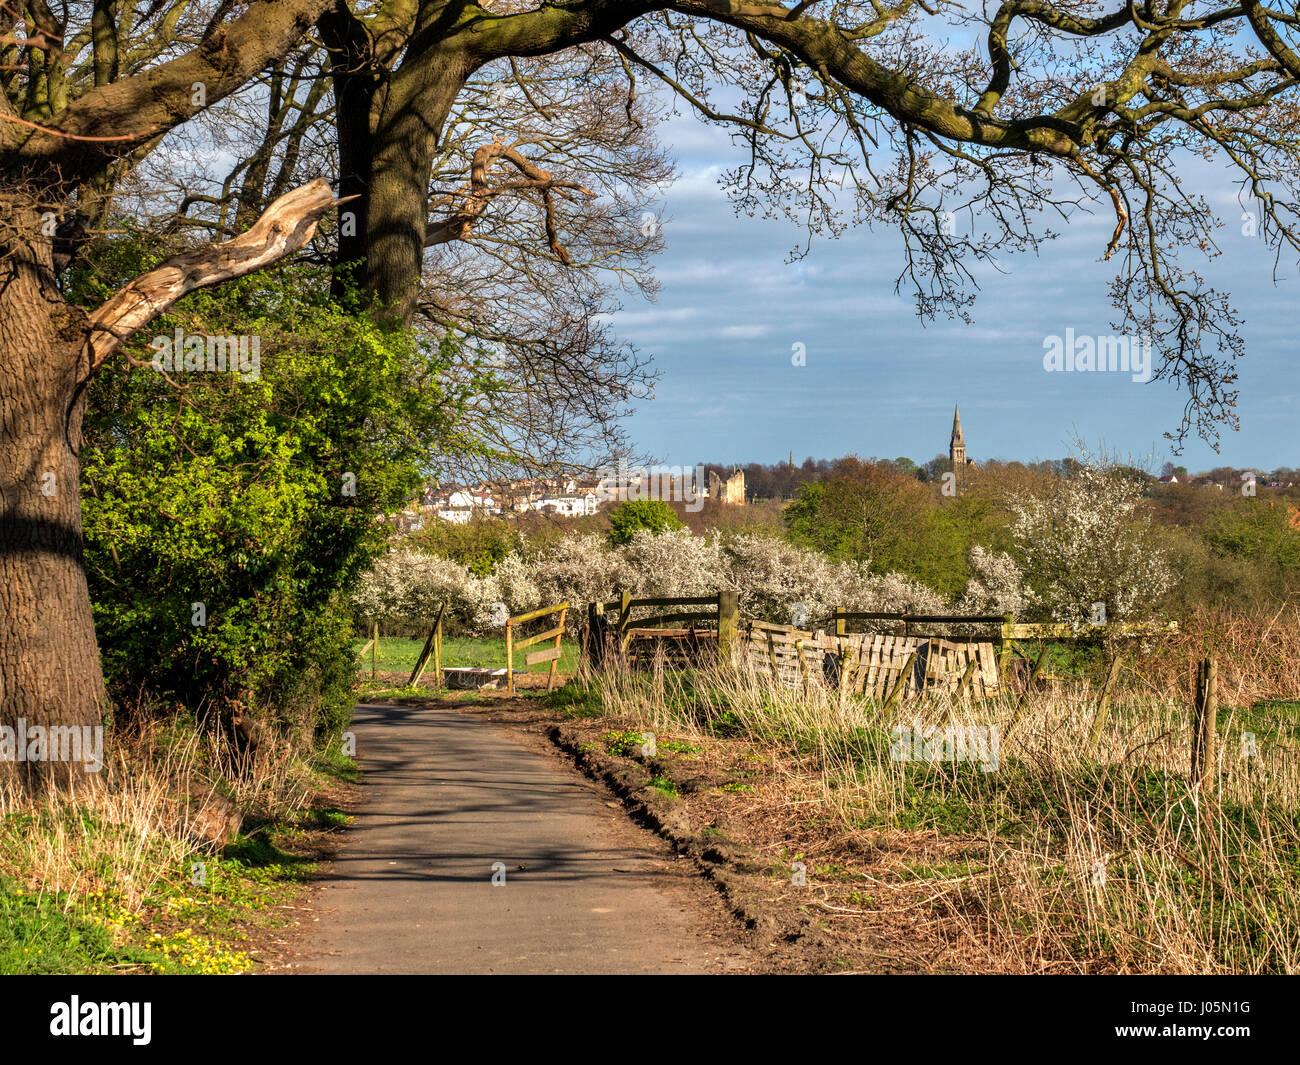 View of Knaresborough from the Beryl Burton Cycleway near Knaresborough North Yorkshire England - Stock Image